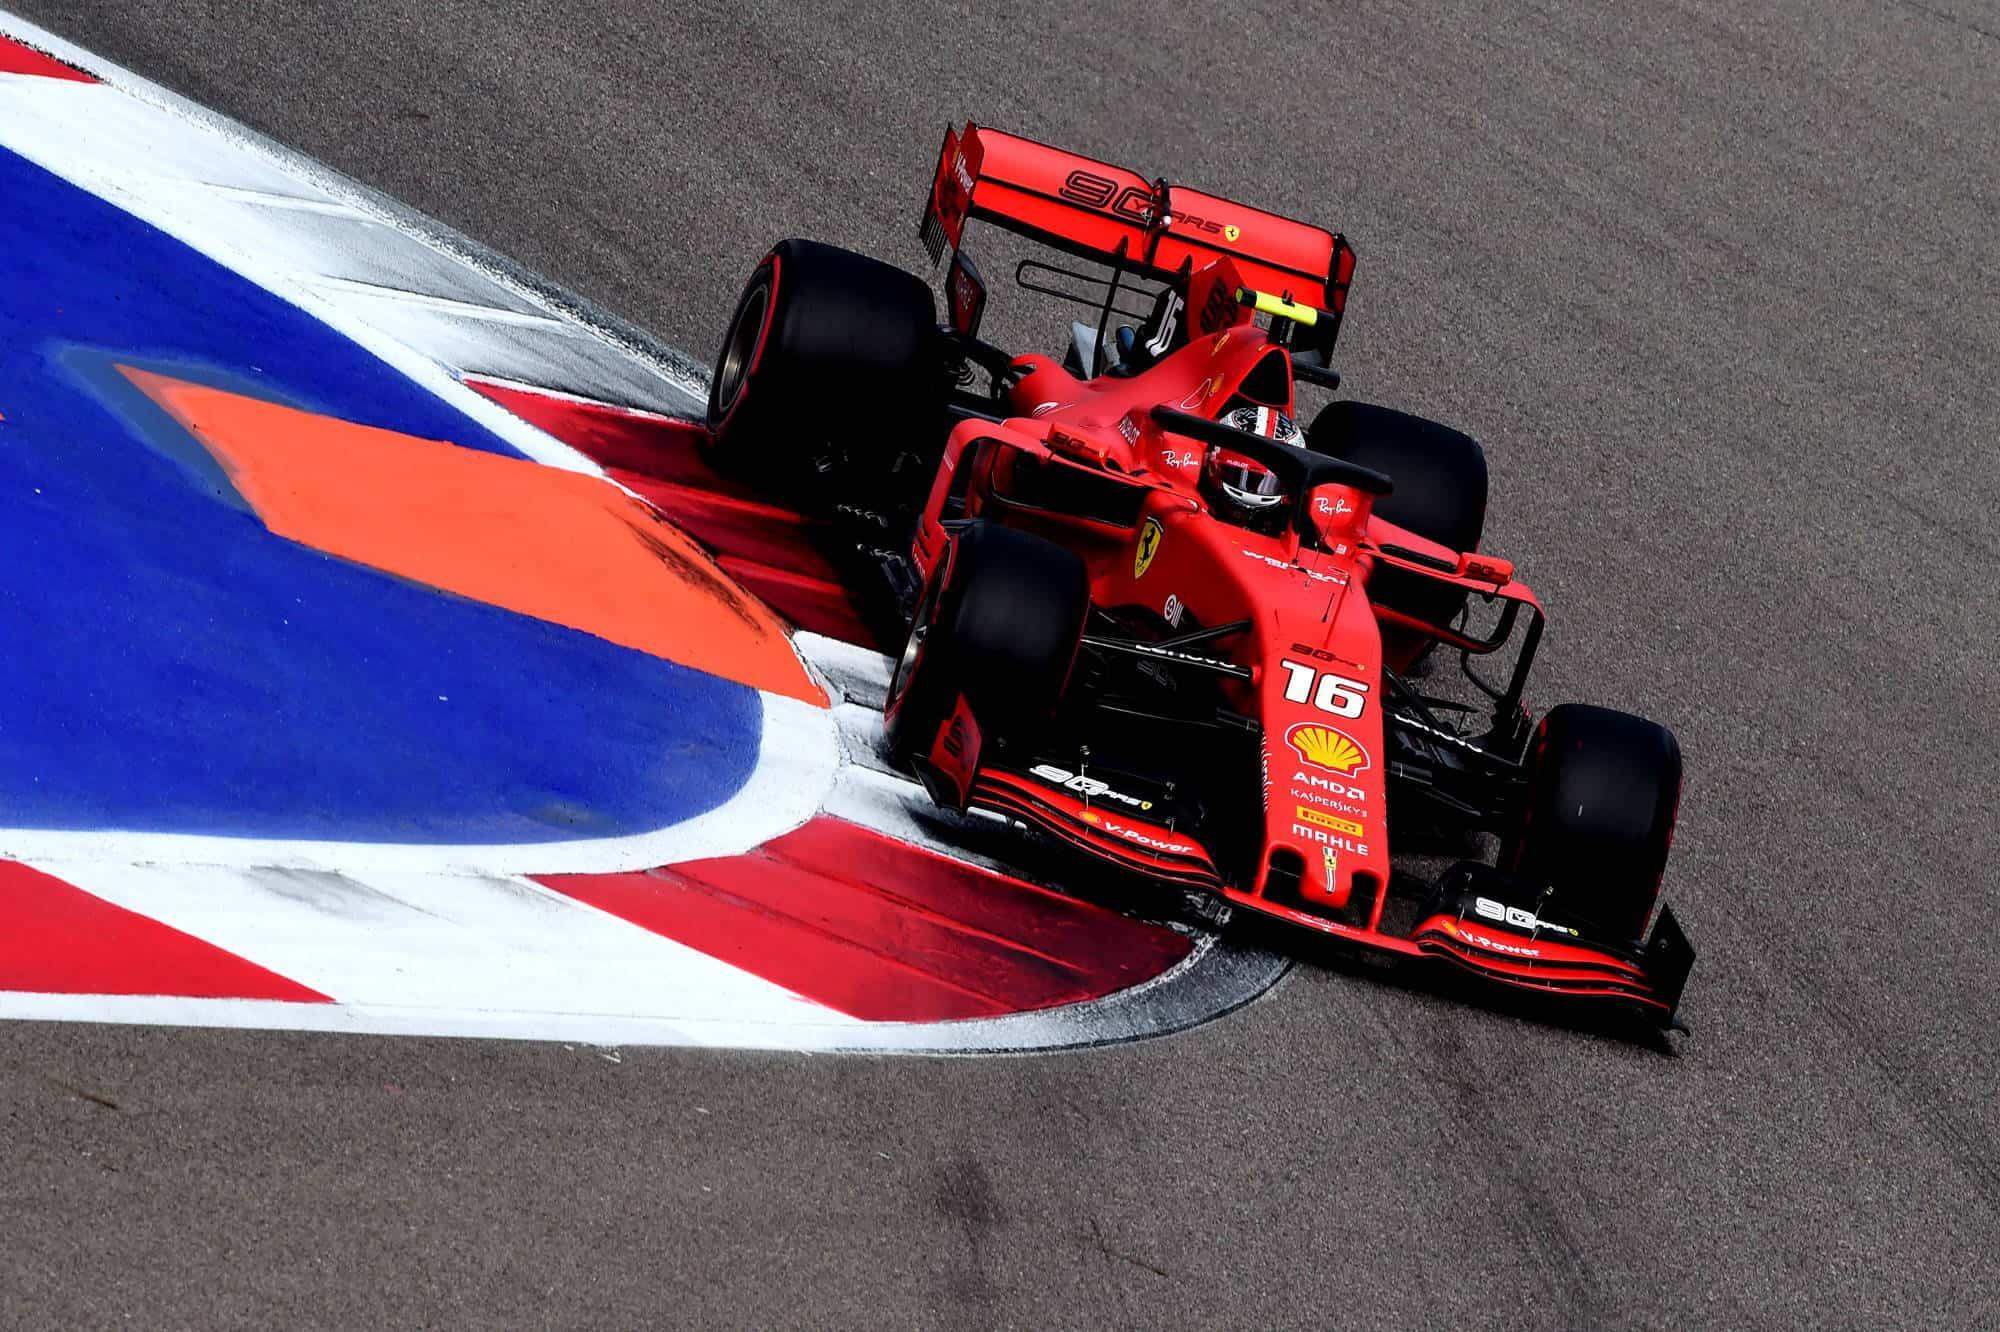 Charles Leclerc Ferrari Russian GP F1 2019 FP3 soft Photo Ferrari